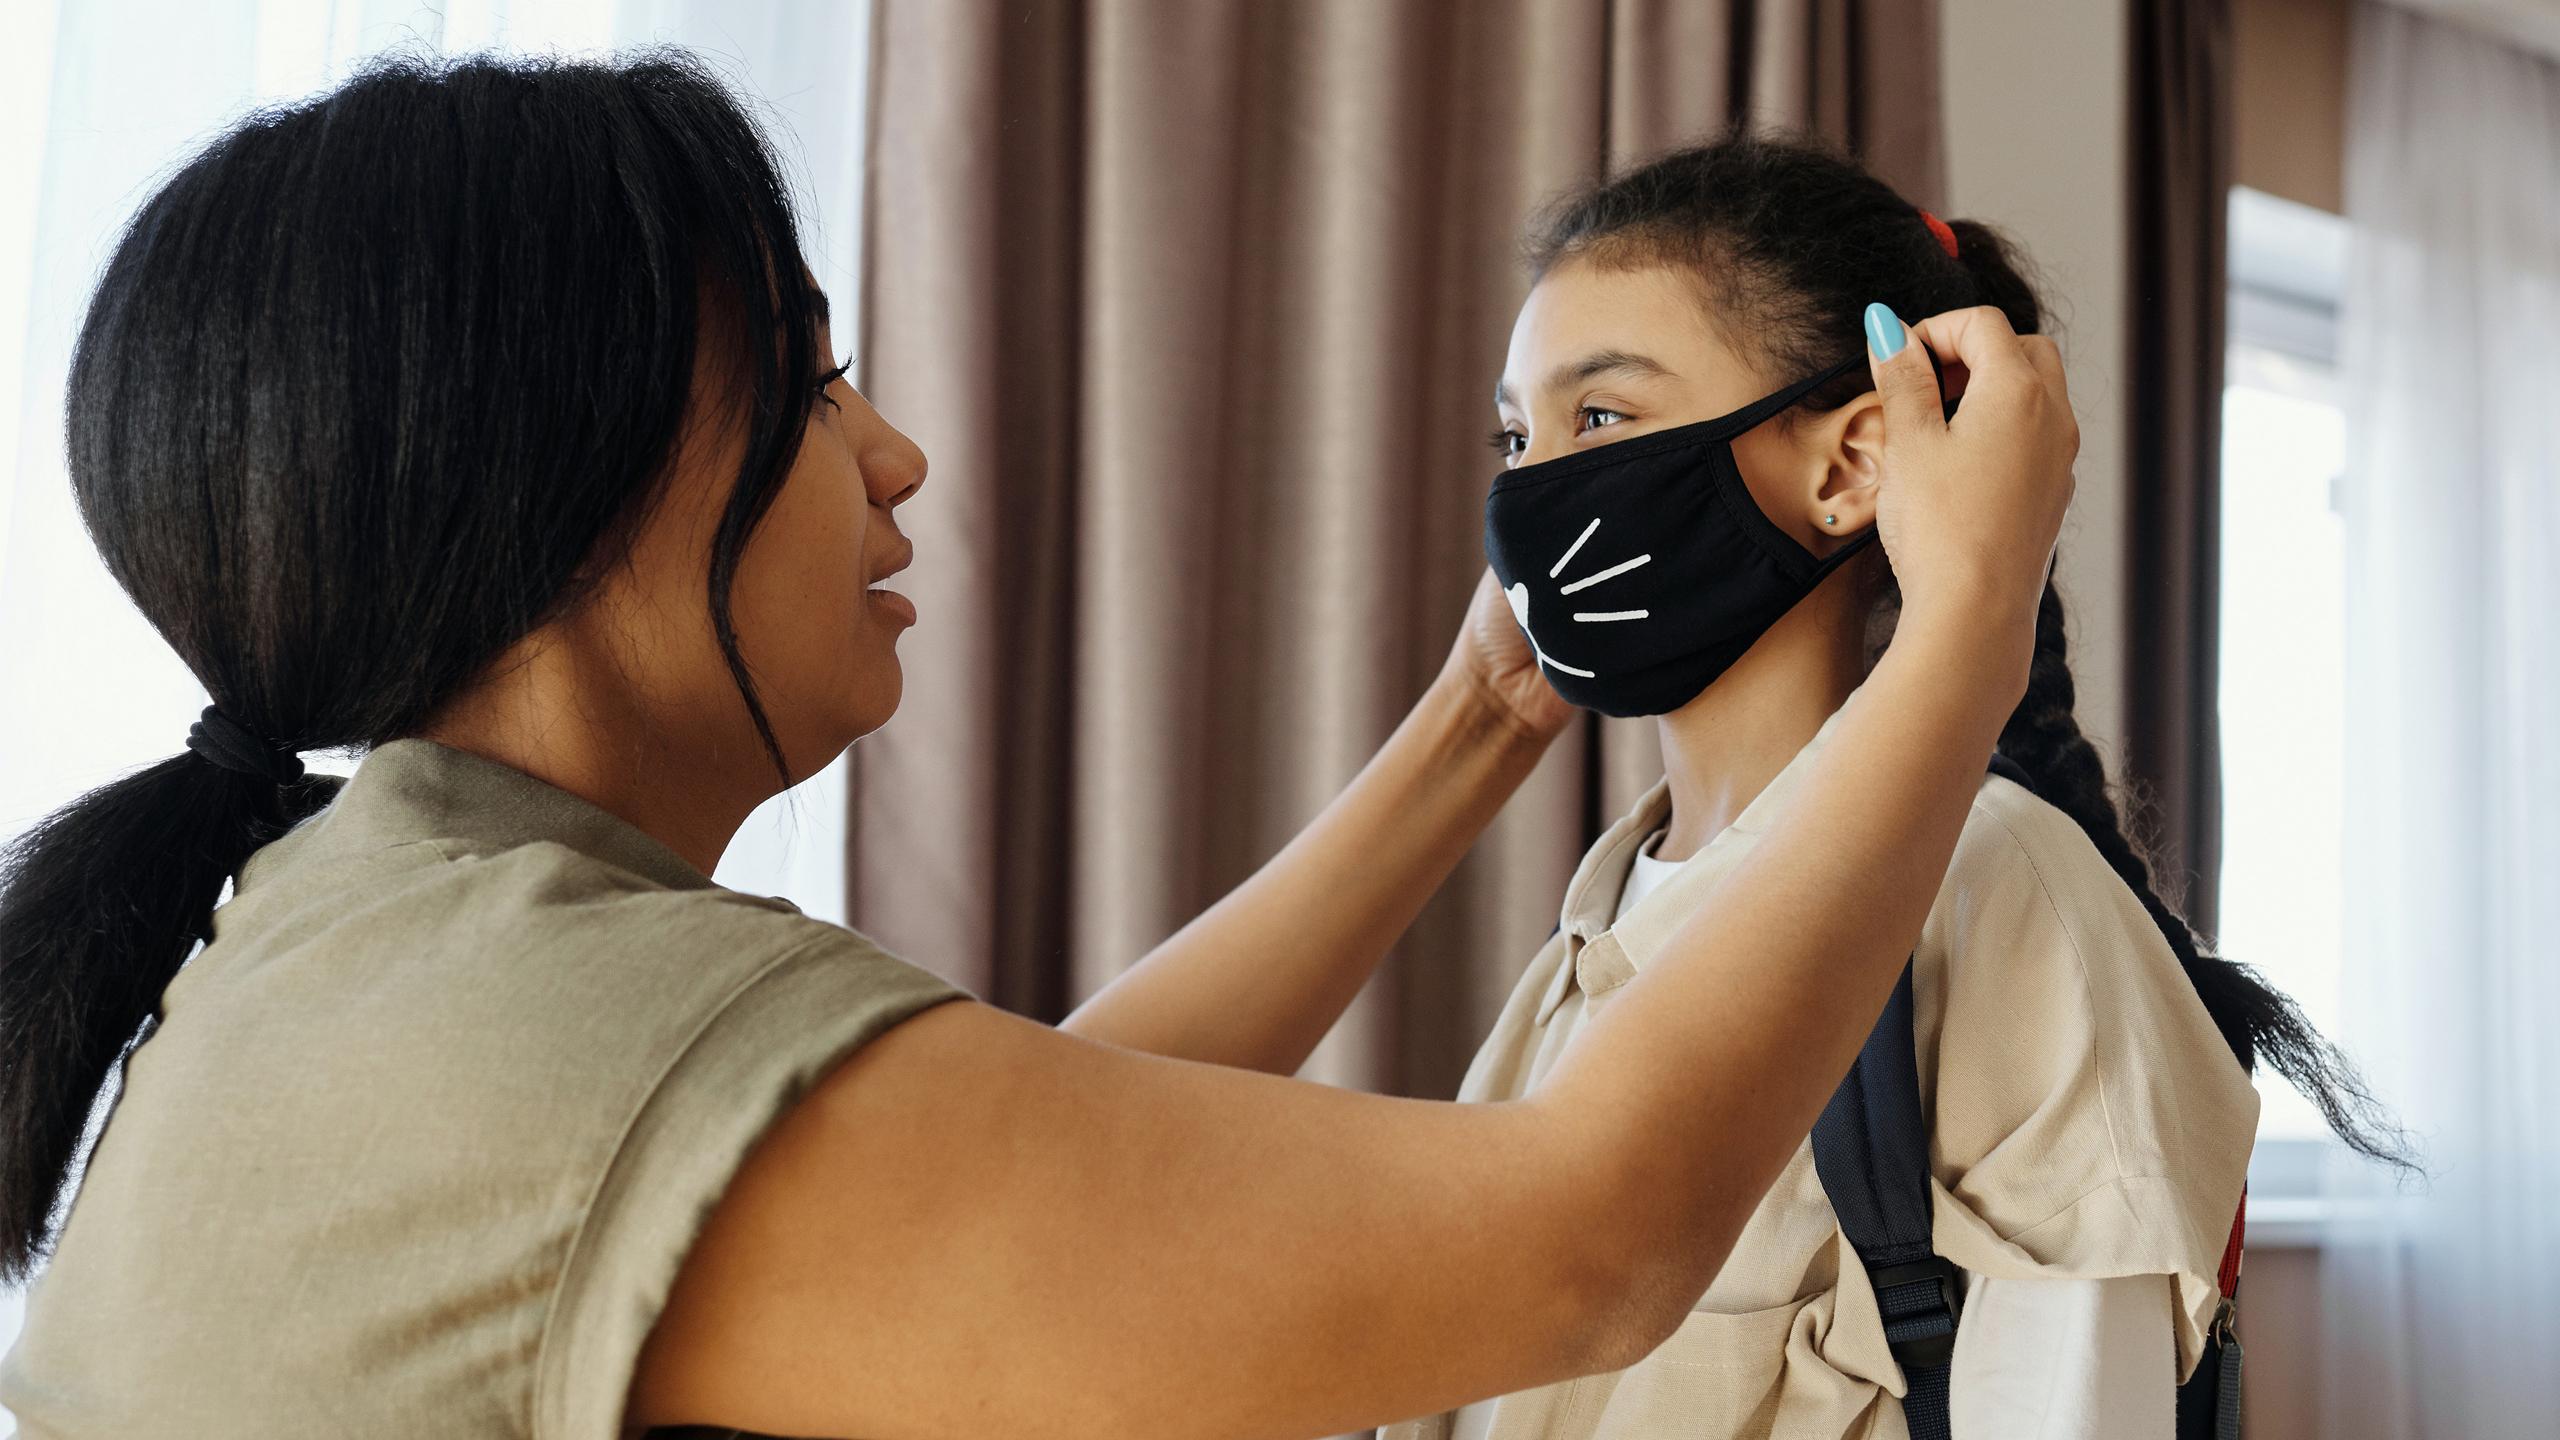 Family Kids COVID-19 Face Masks